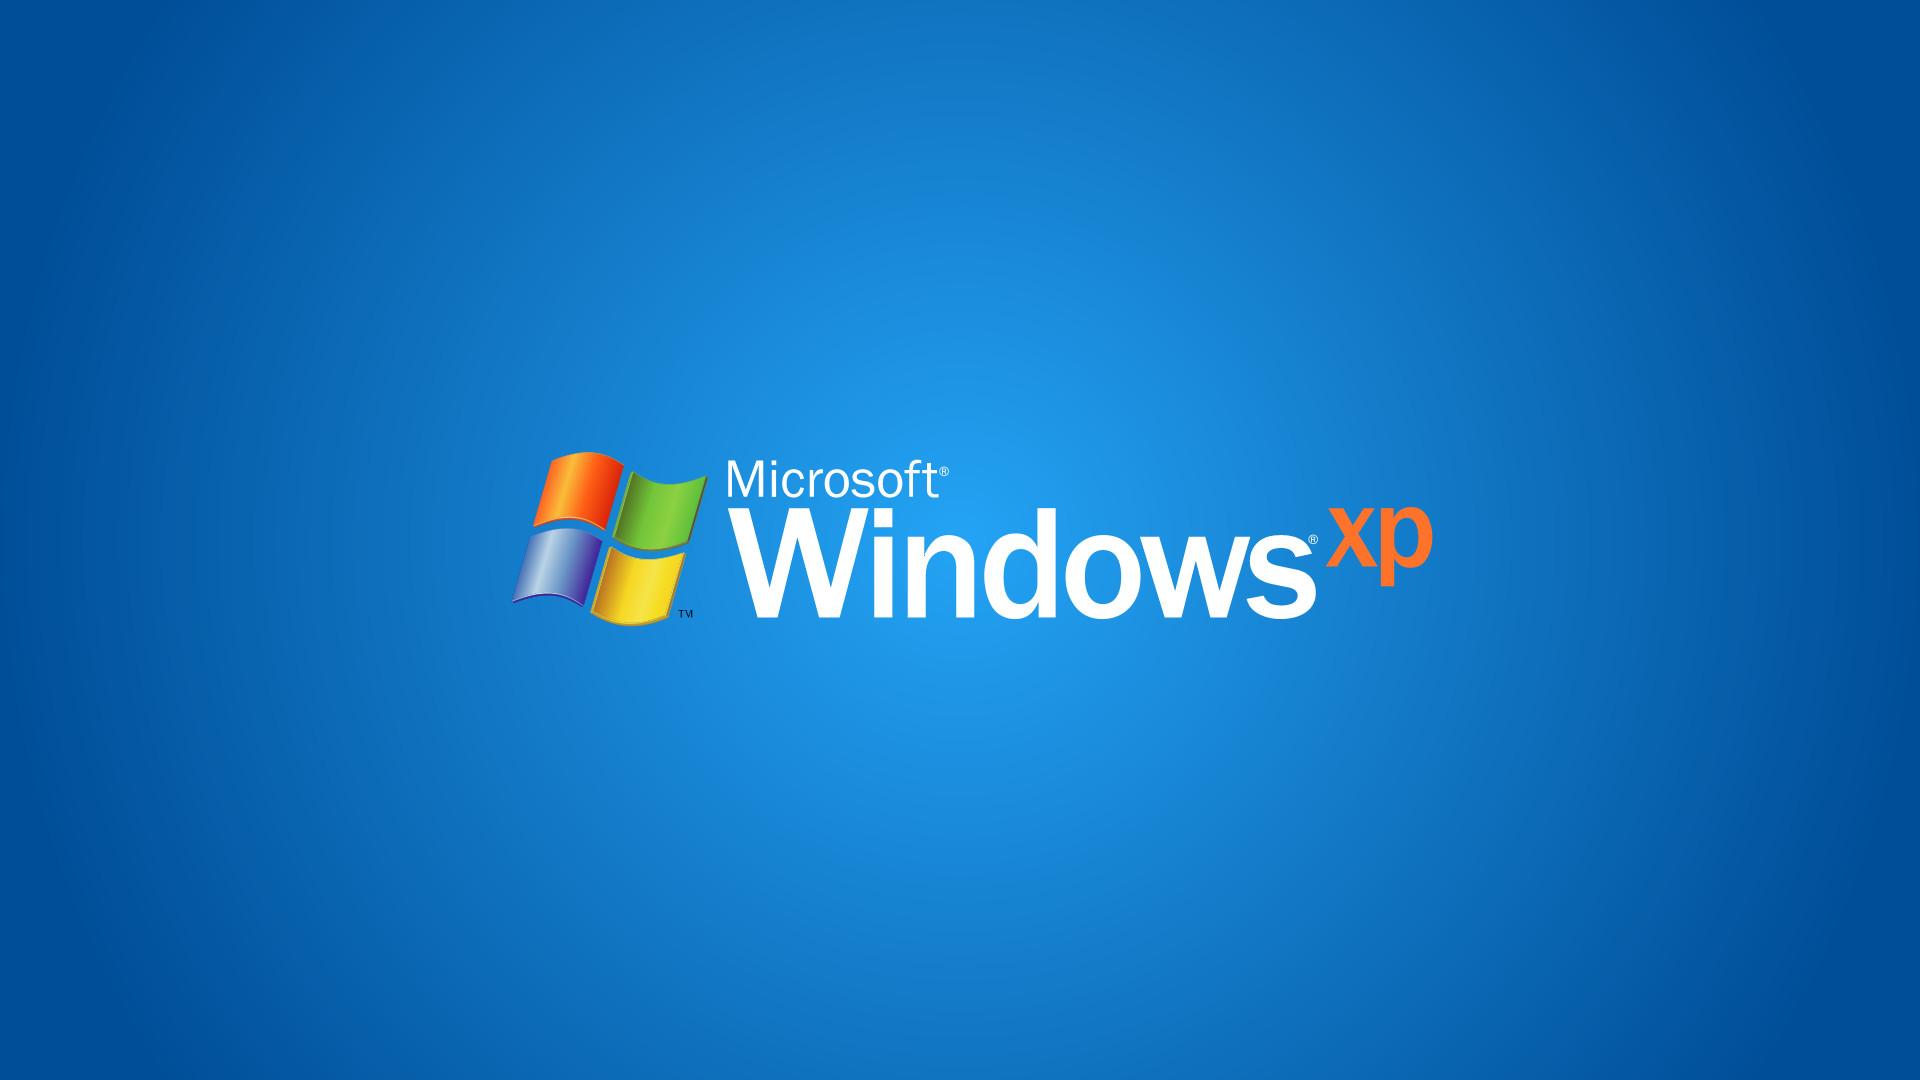 Windows XP Bliss Wallpaper Now DazheW